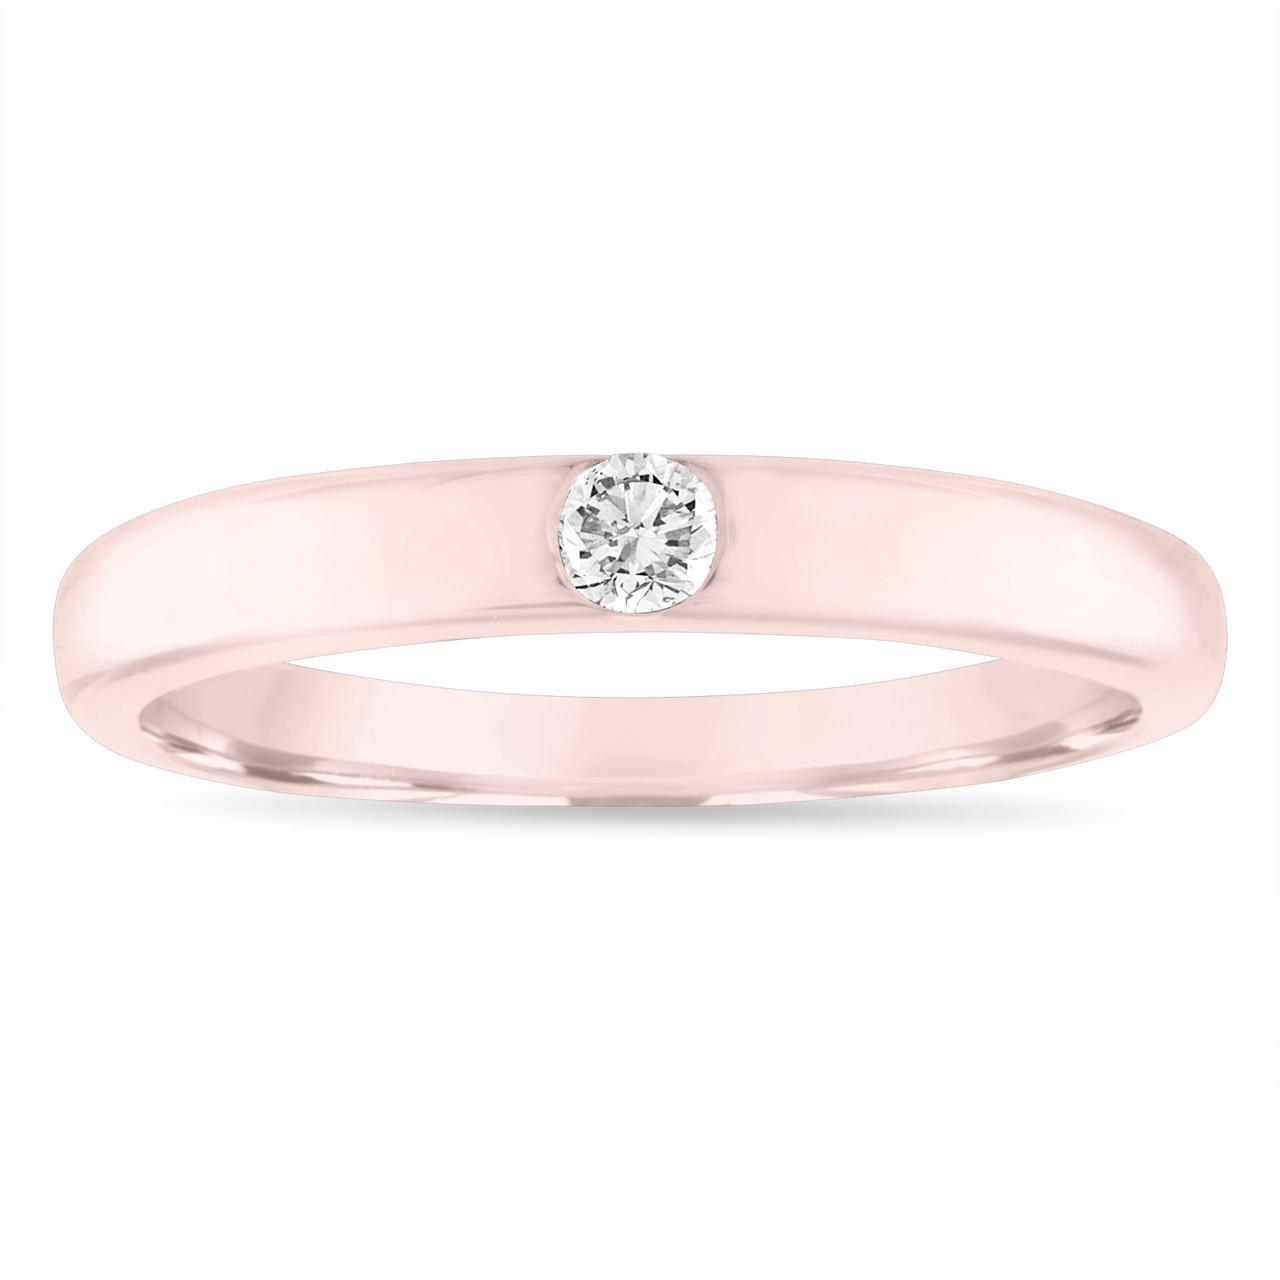 Rose Gold Wedding Band.Rose Gold Diamond Wedding Band 0 10 Carat Diamond Wedding Ring Womens Solitaire Engagement Ring 3 Mm Anniversary Ring Handmade